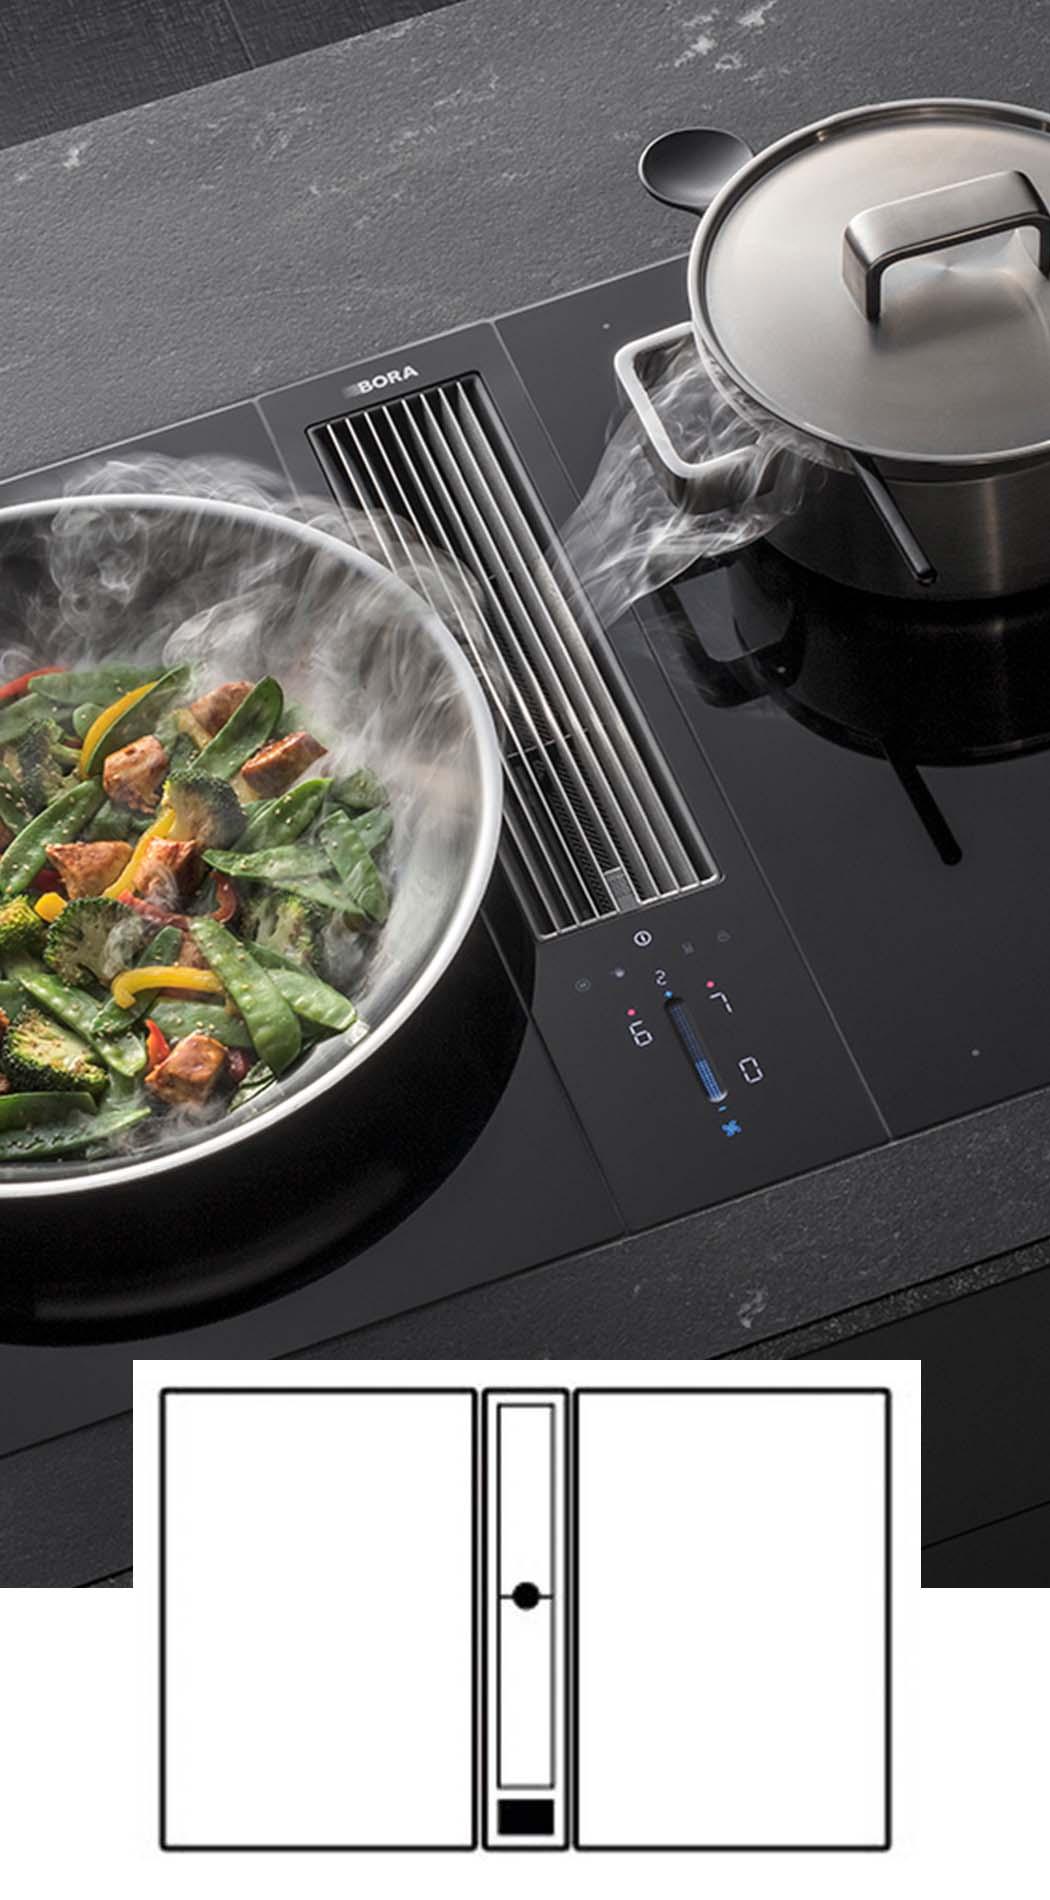 BORA Classic 2.0 - BORA kookplaat met afzuiging, ASWA Keukens